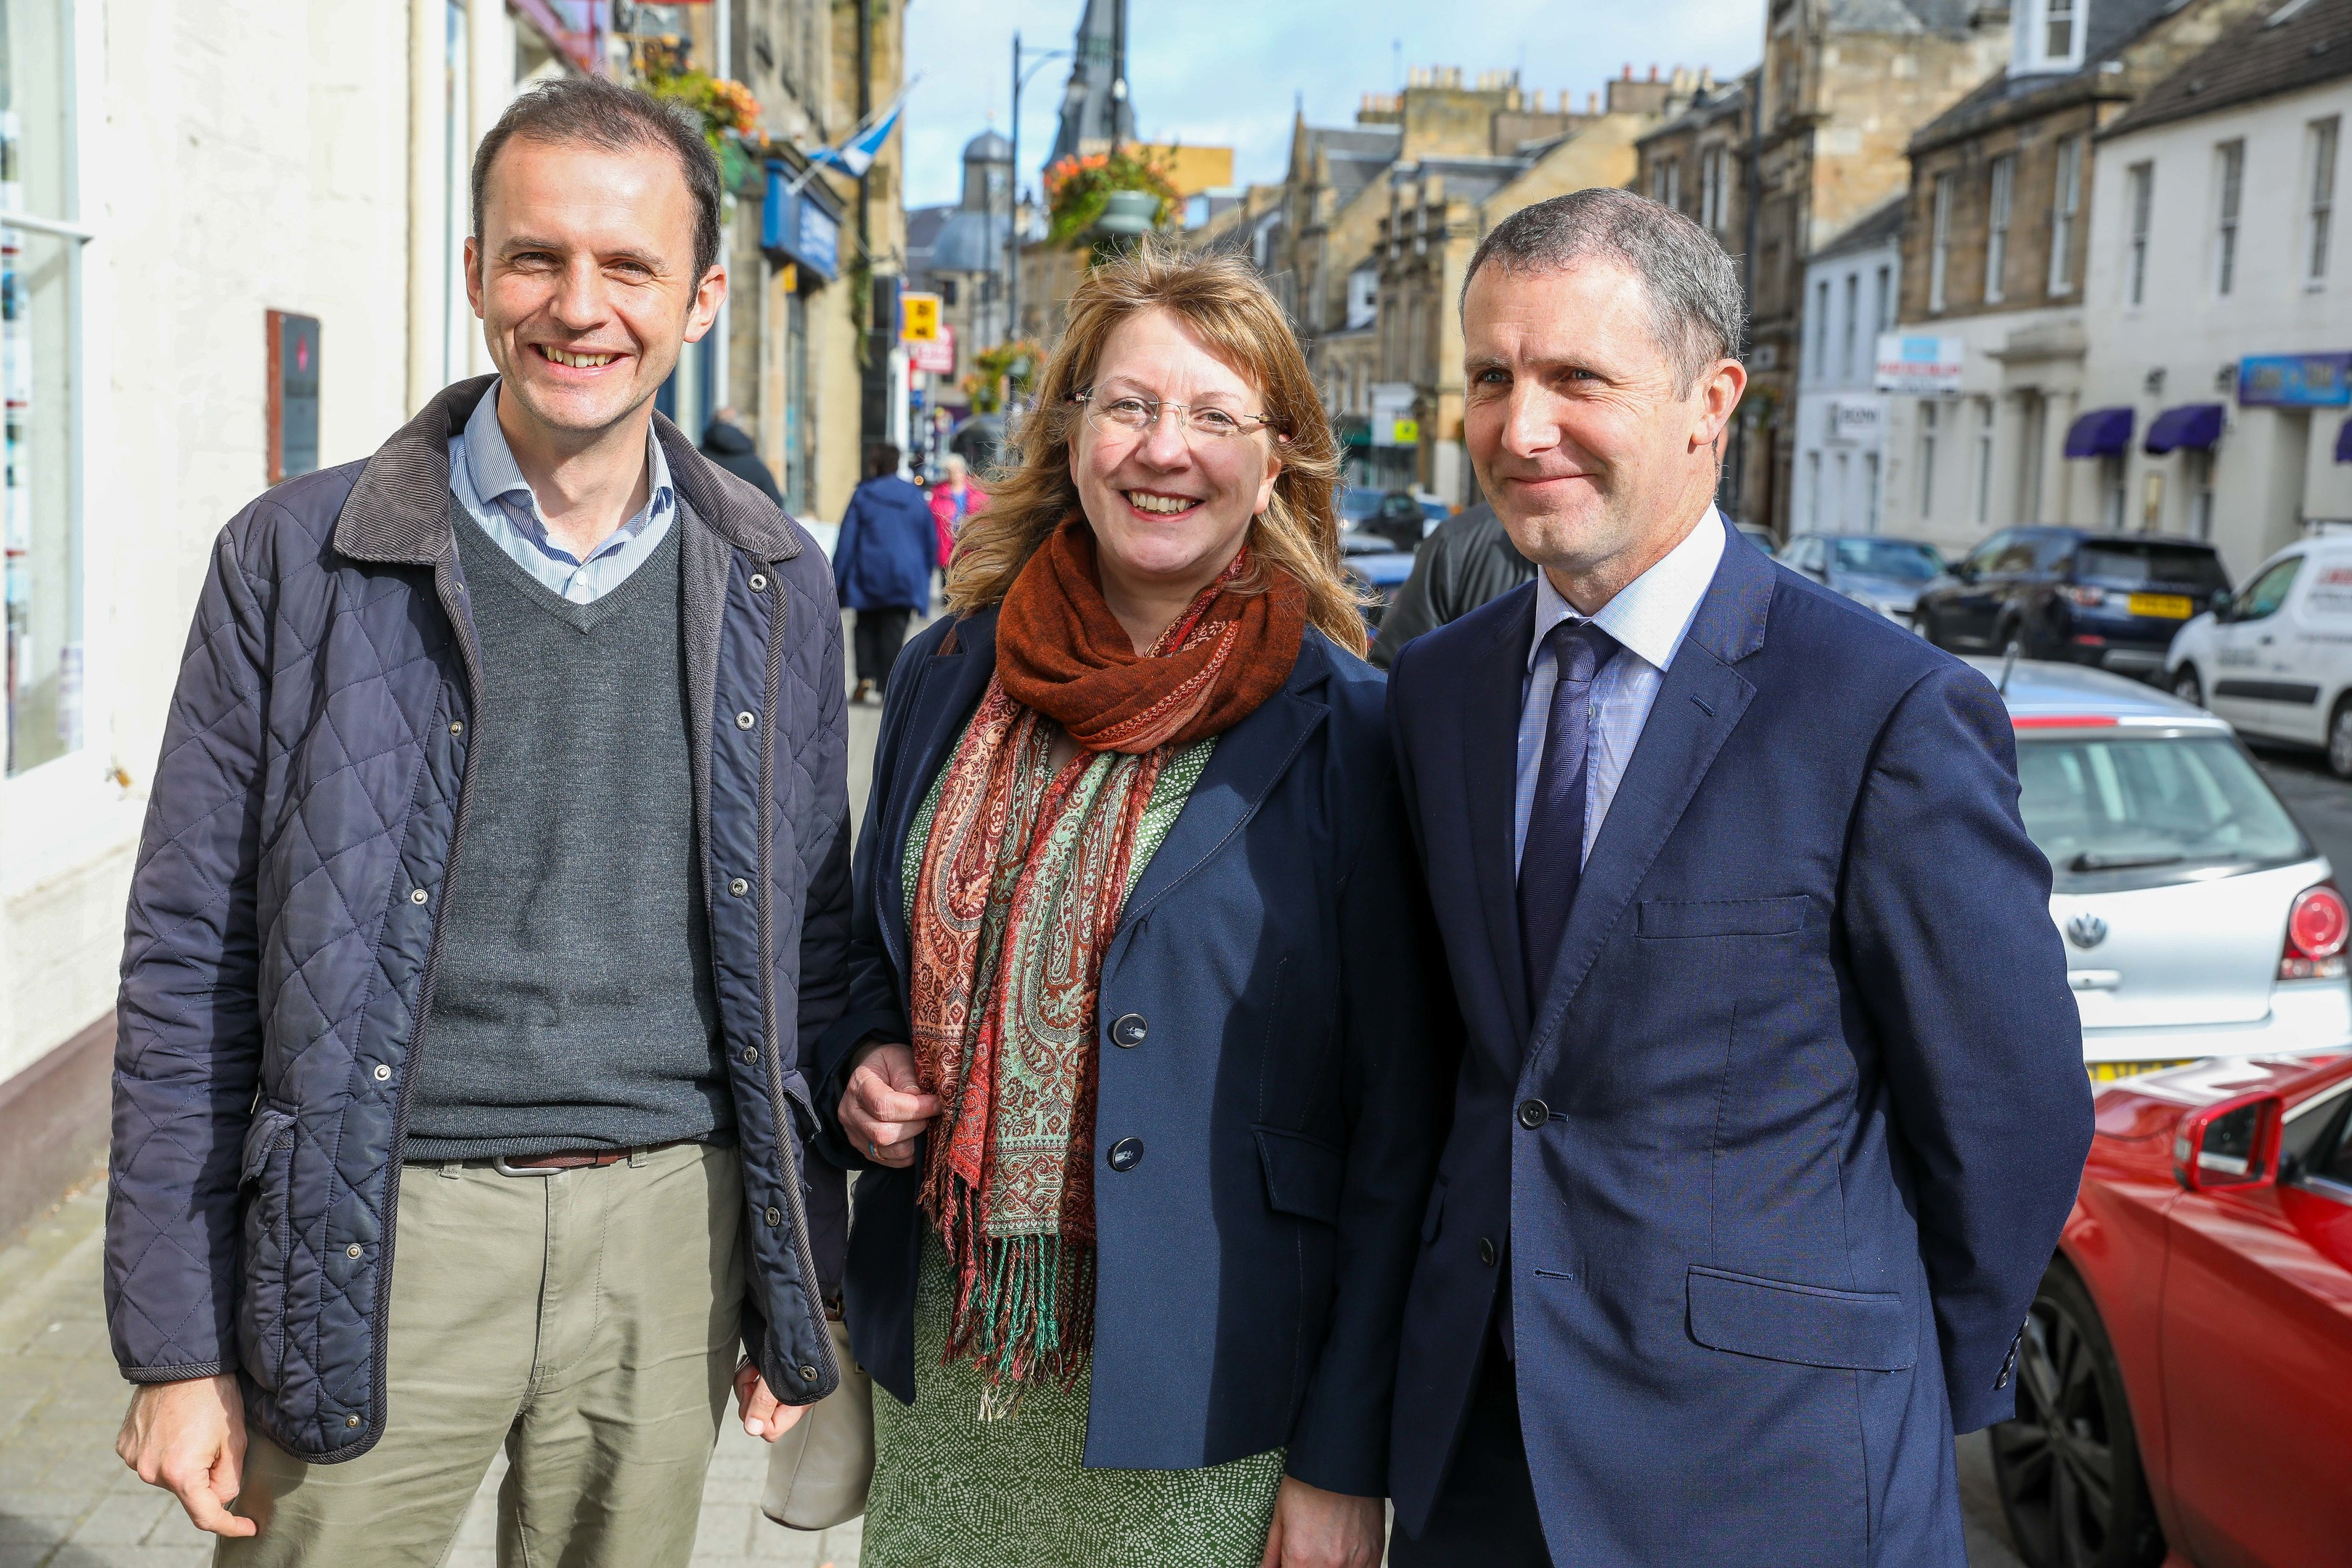 Local MP Stephen Gethins, Councillor Karen Marjoram and Scottish connectivity secretary Michael Matheson.